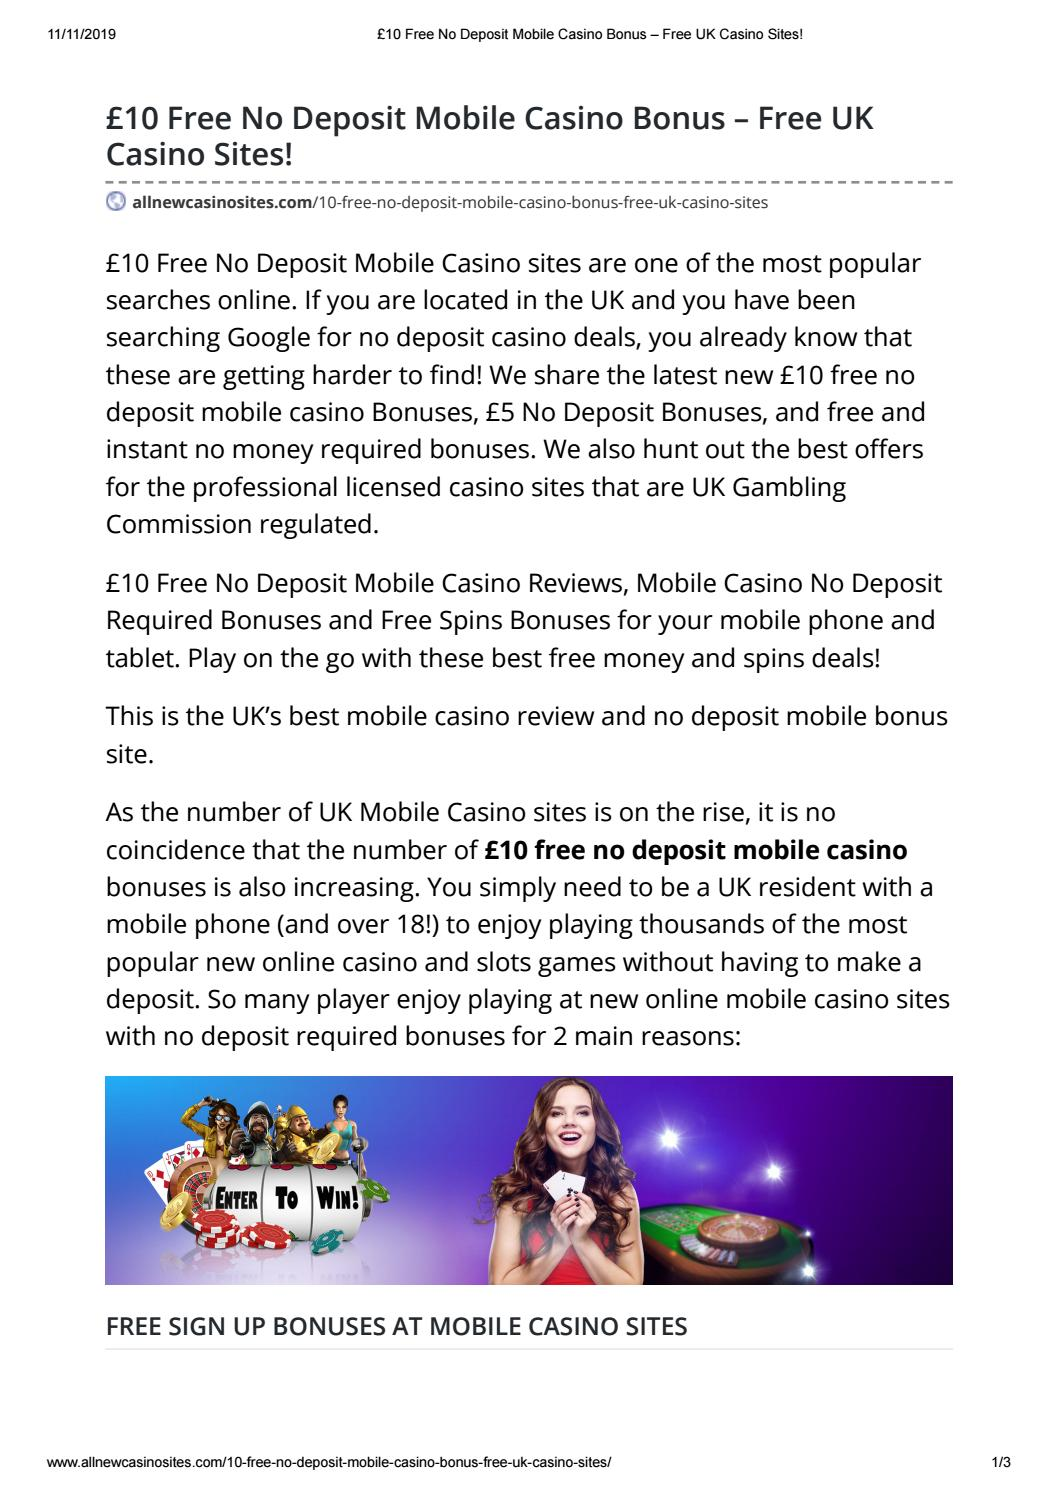 10 Free No Deposit Mobile Casino Bonus Free Uk Casino Sites By